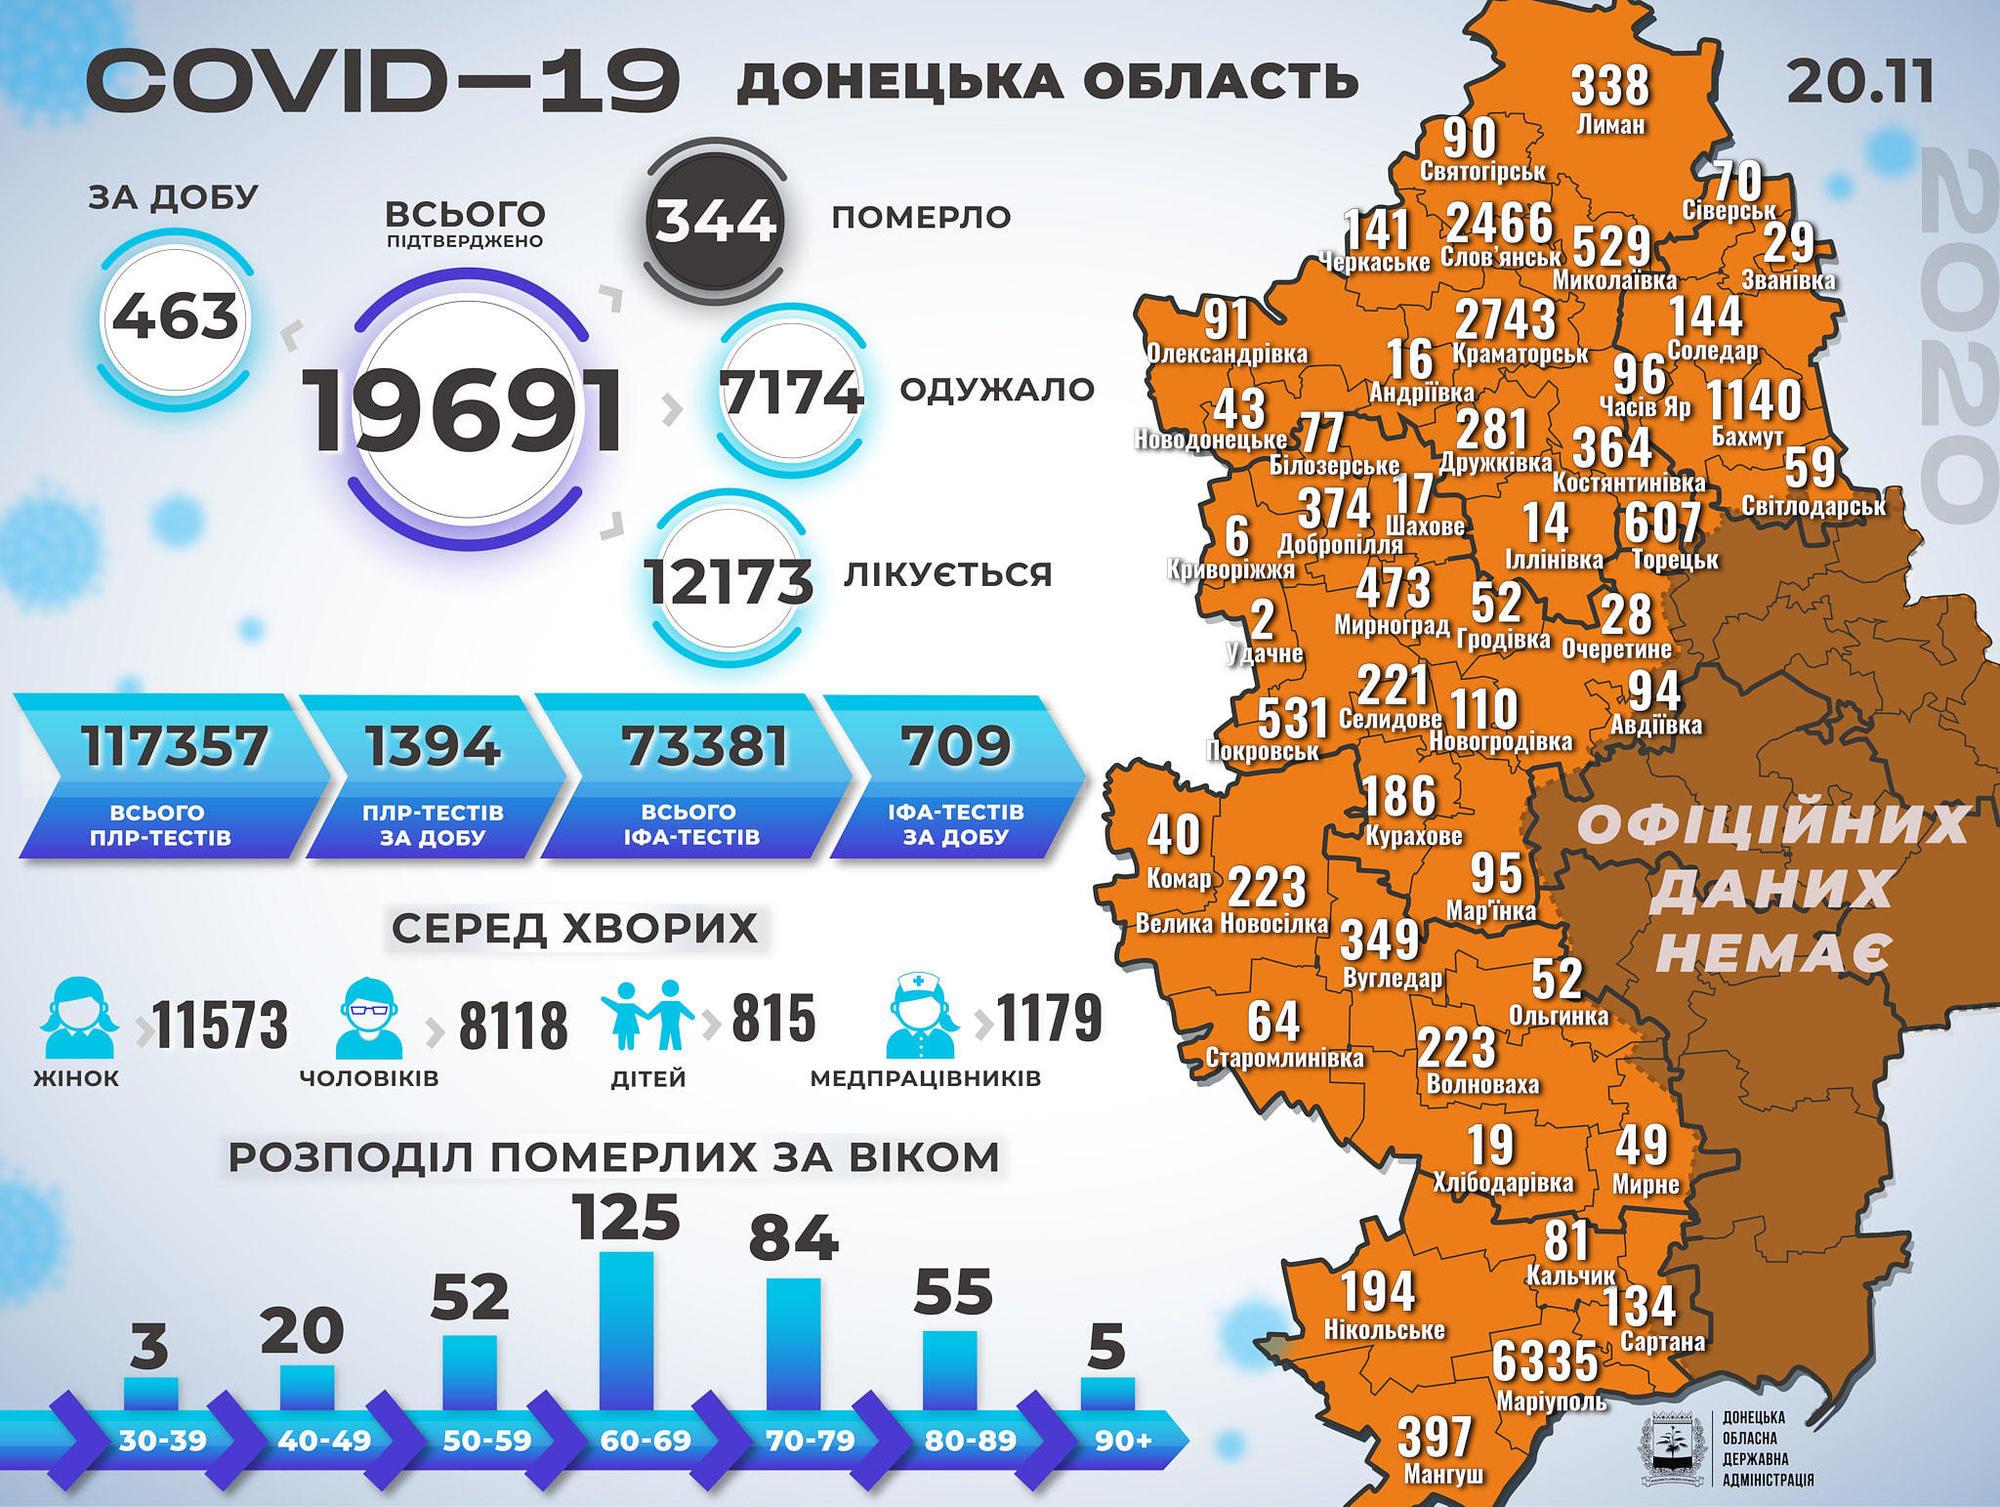 COVID-19 Донецька область на 21 листопада